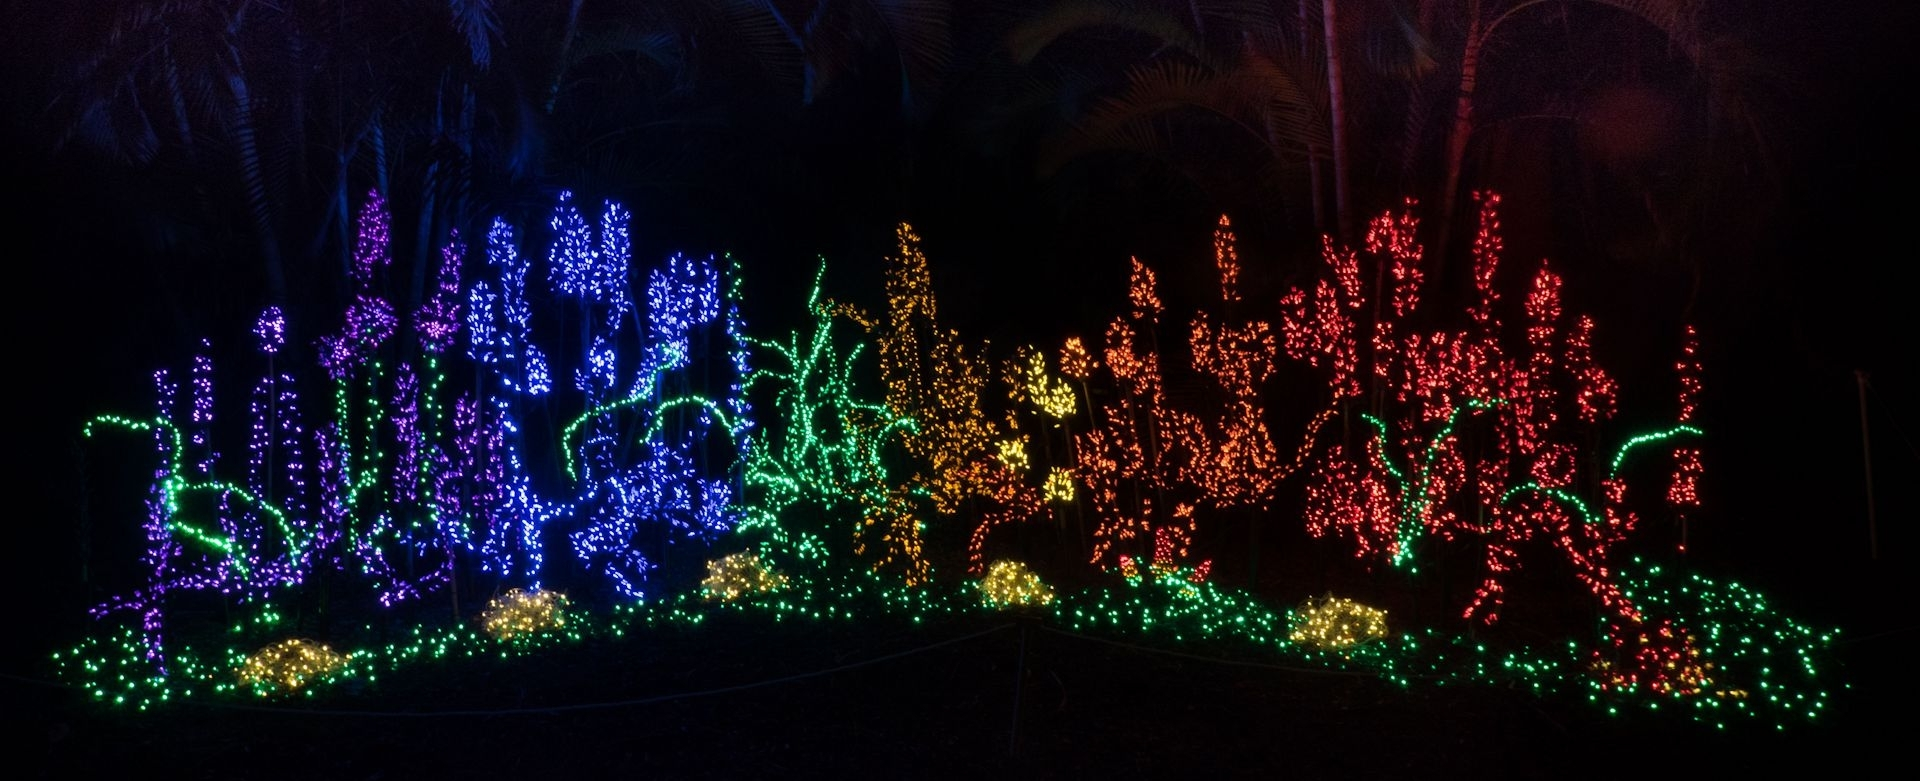 Widely Used Botanical Garden Lights For Garden Of Lights – Heathcote Botanical Gardens (View 16 of 20)